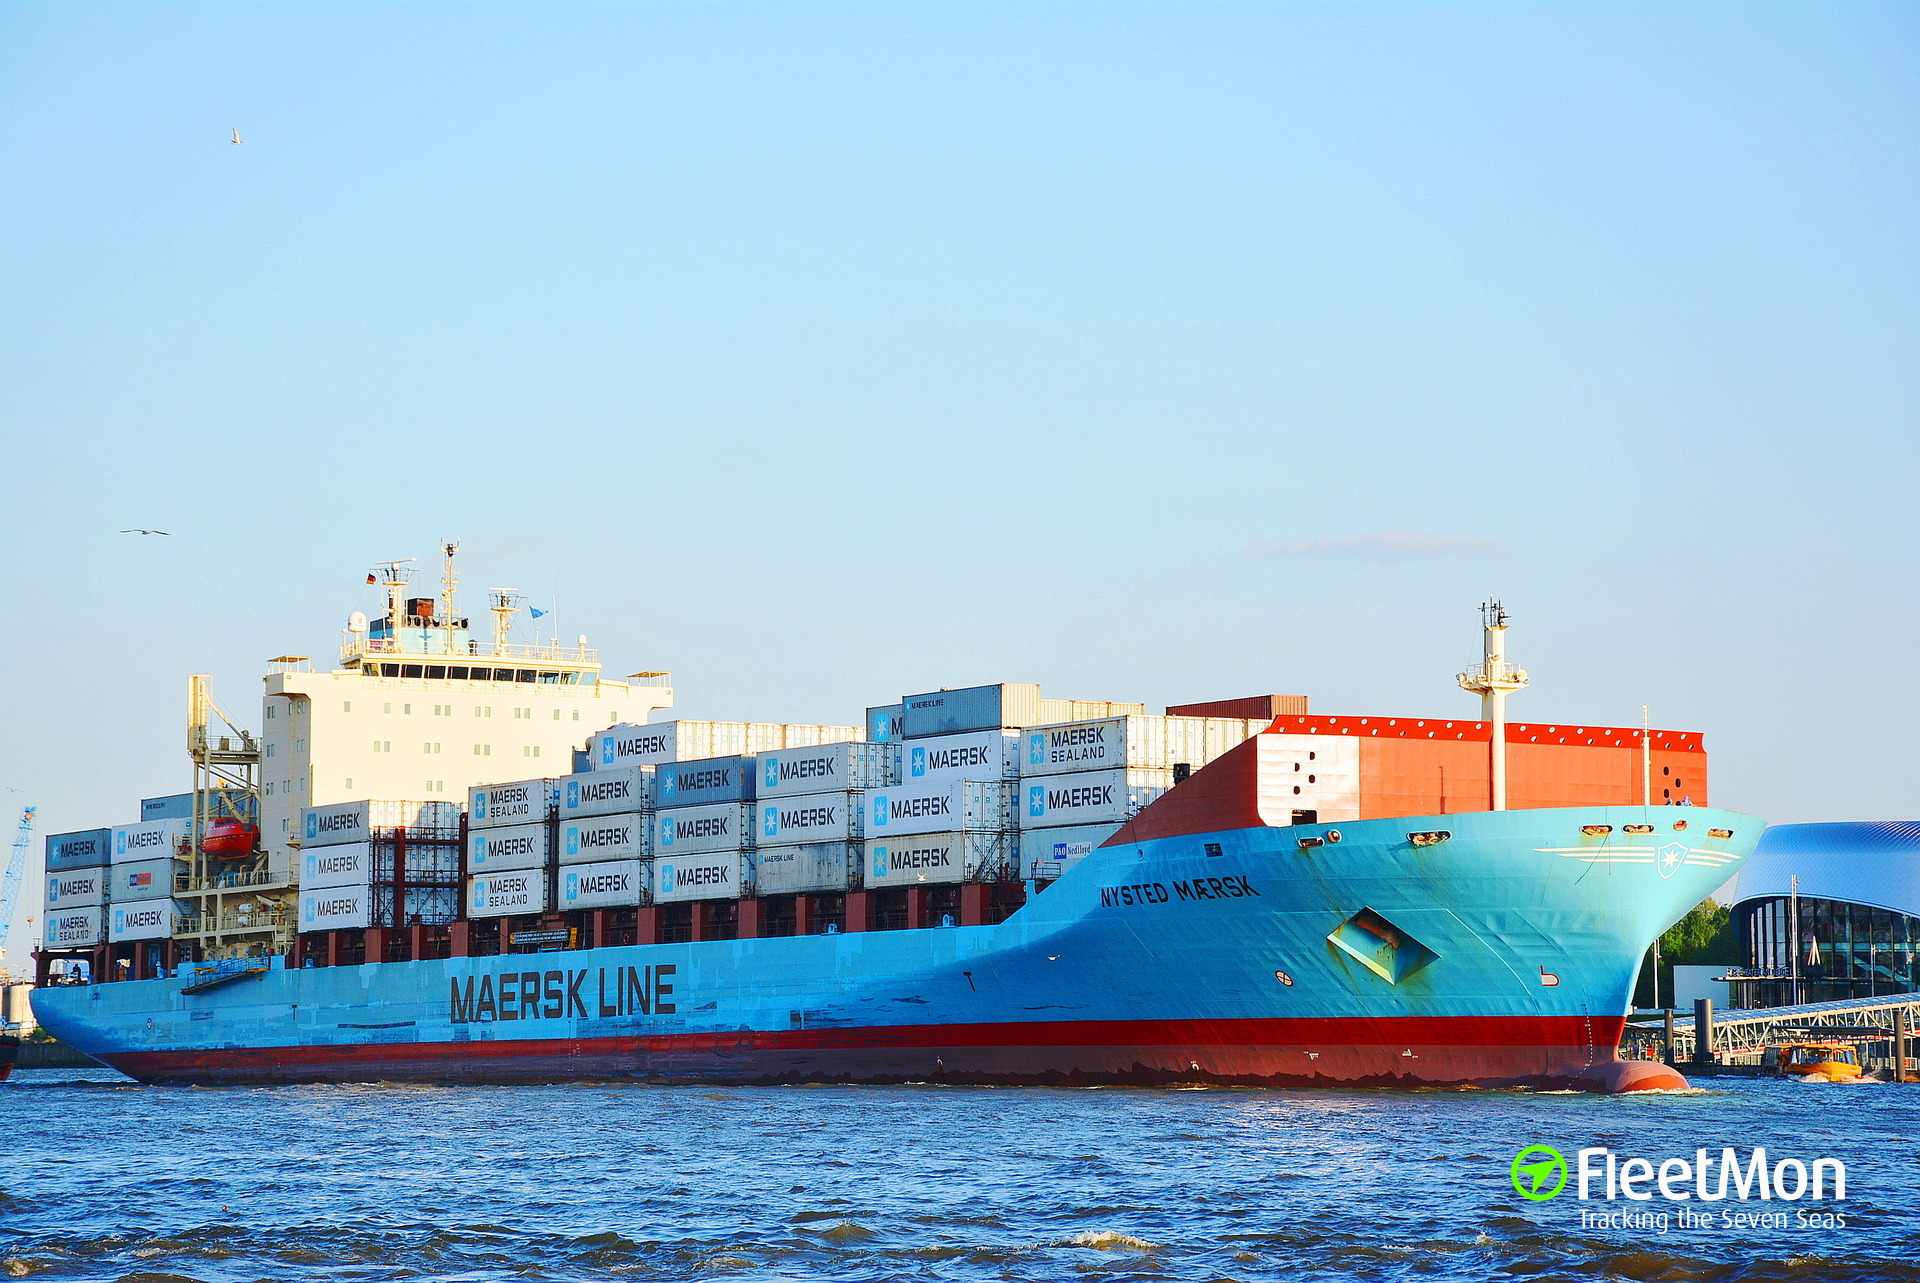 Maersk career sign in